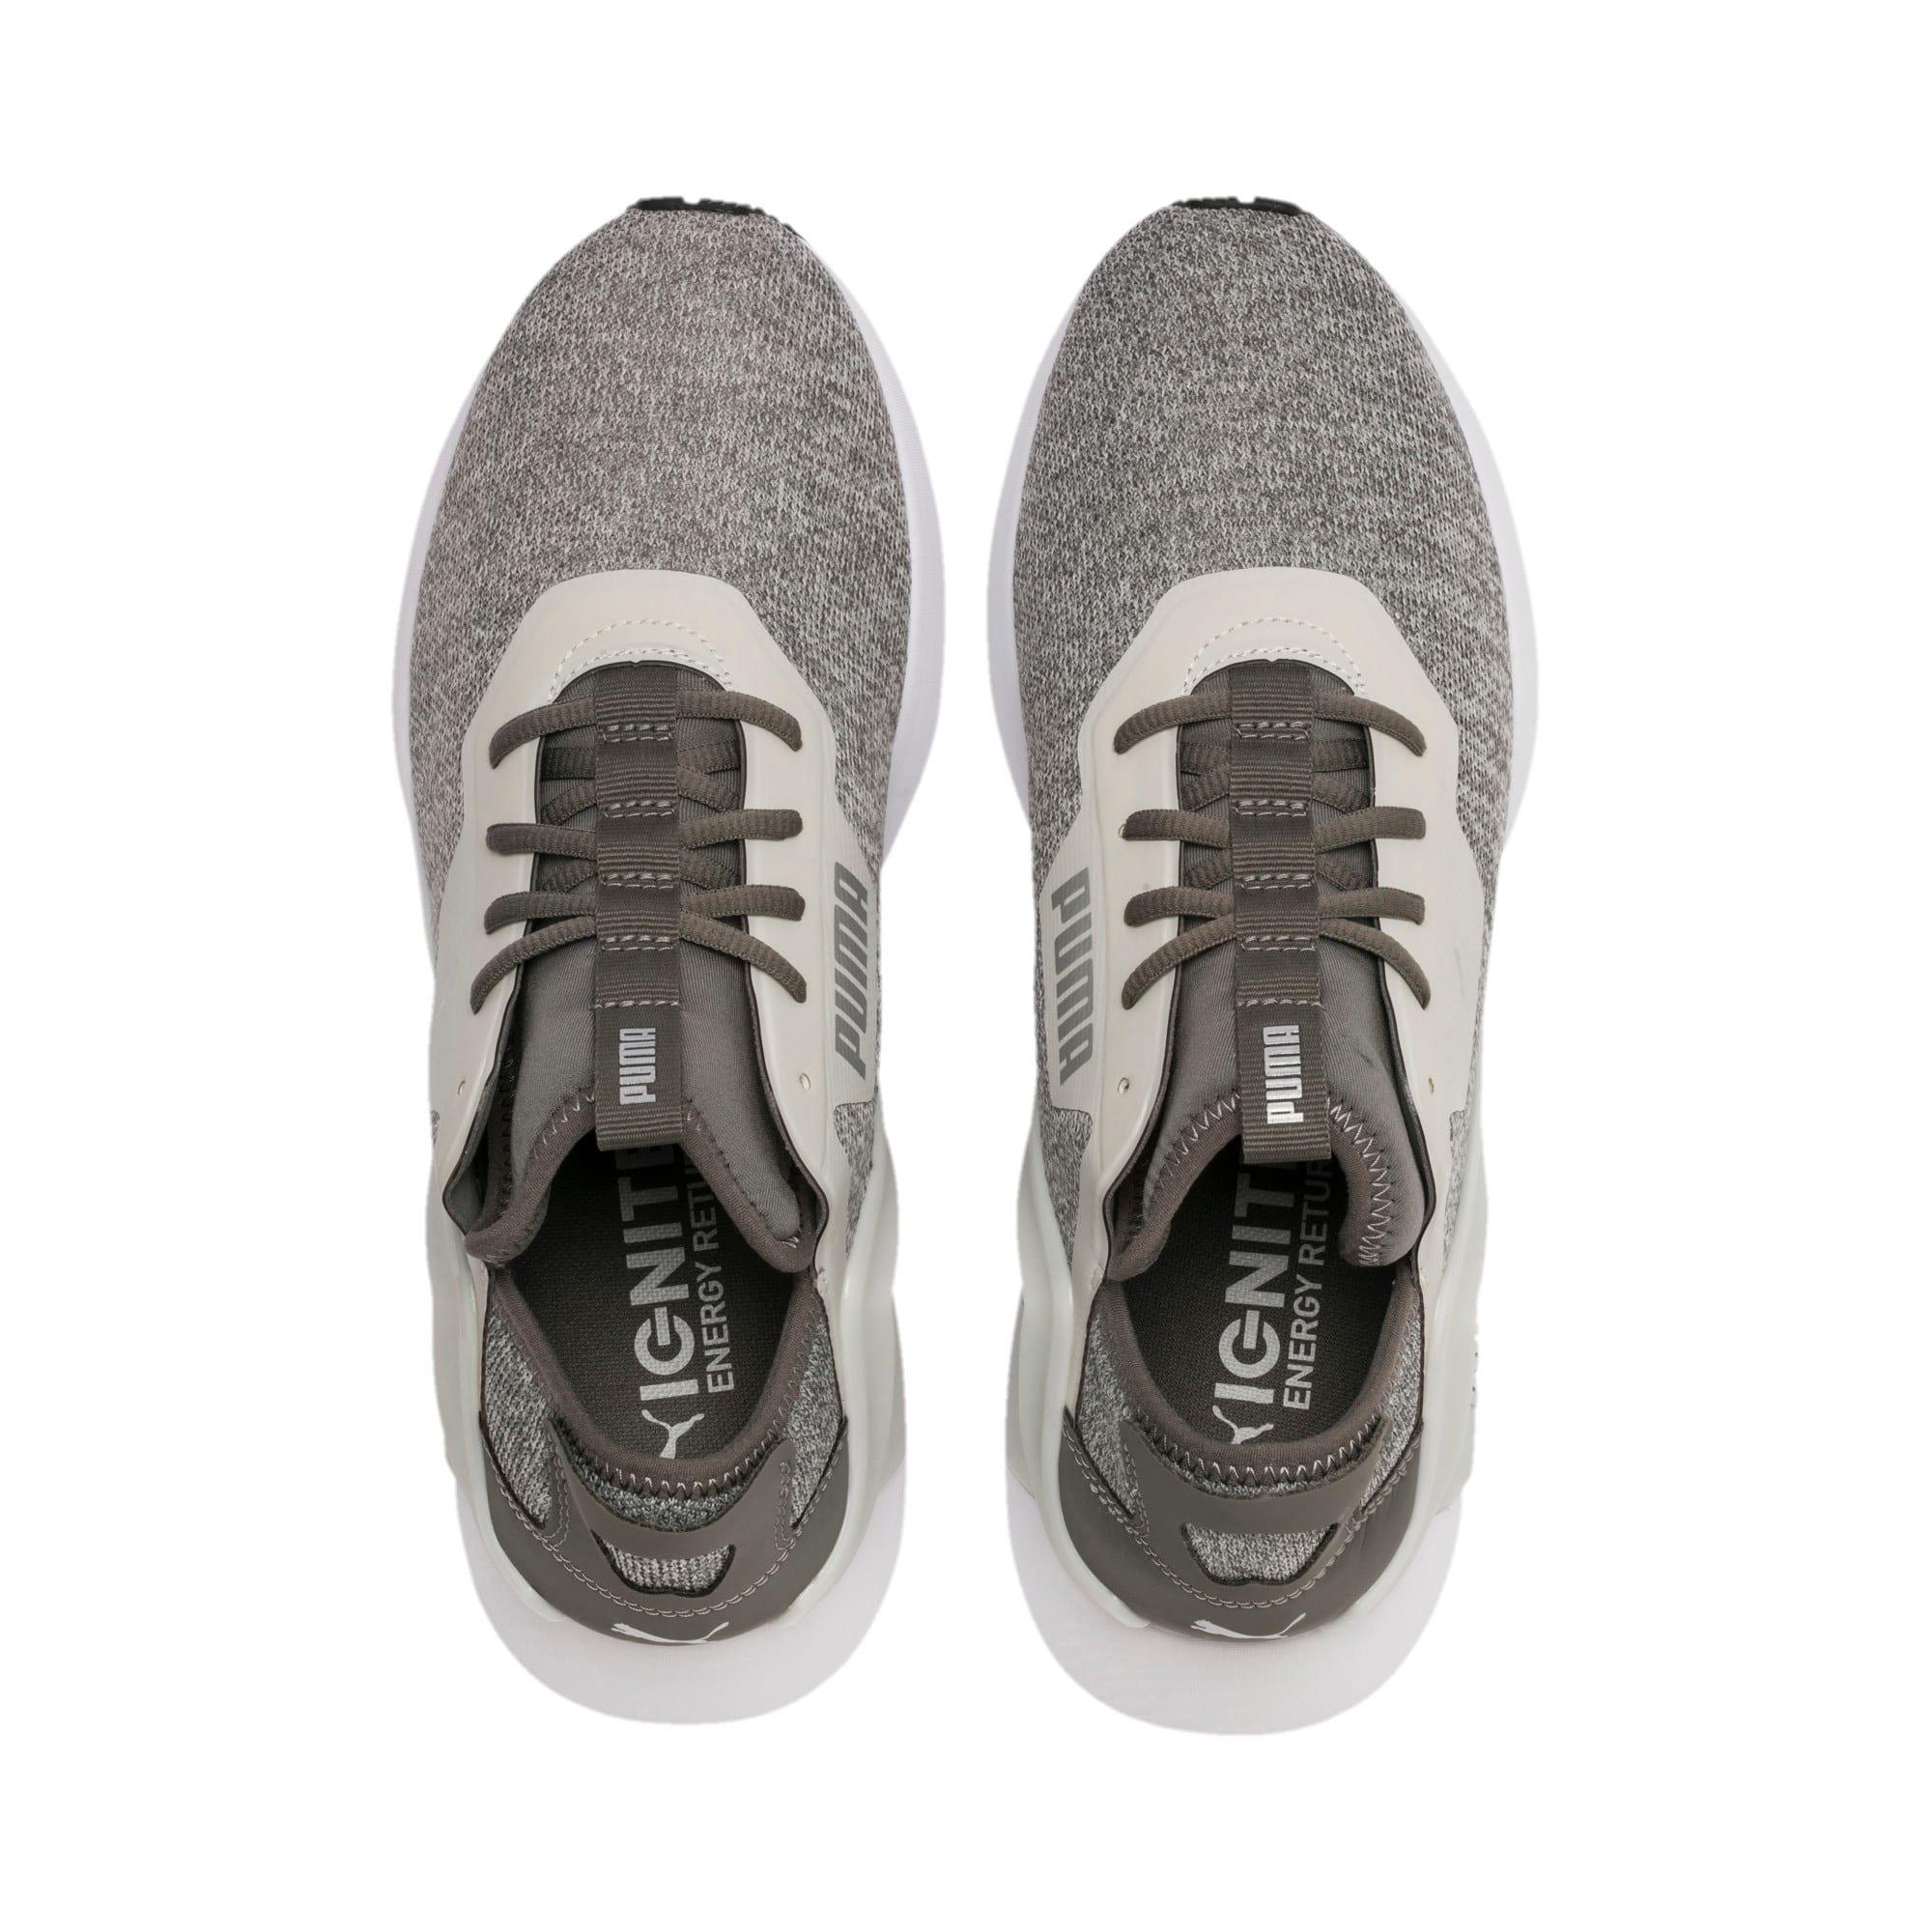 Thumbnail 7 of Rogue X Knit Herren Sneaker, CASTLEROCK-Glacier Gray, medium